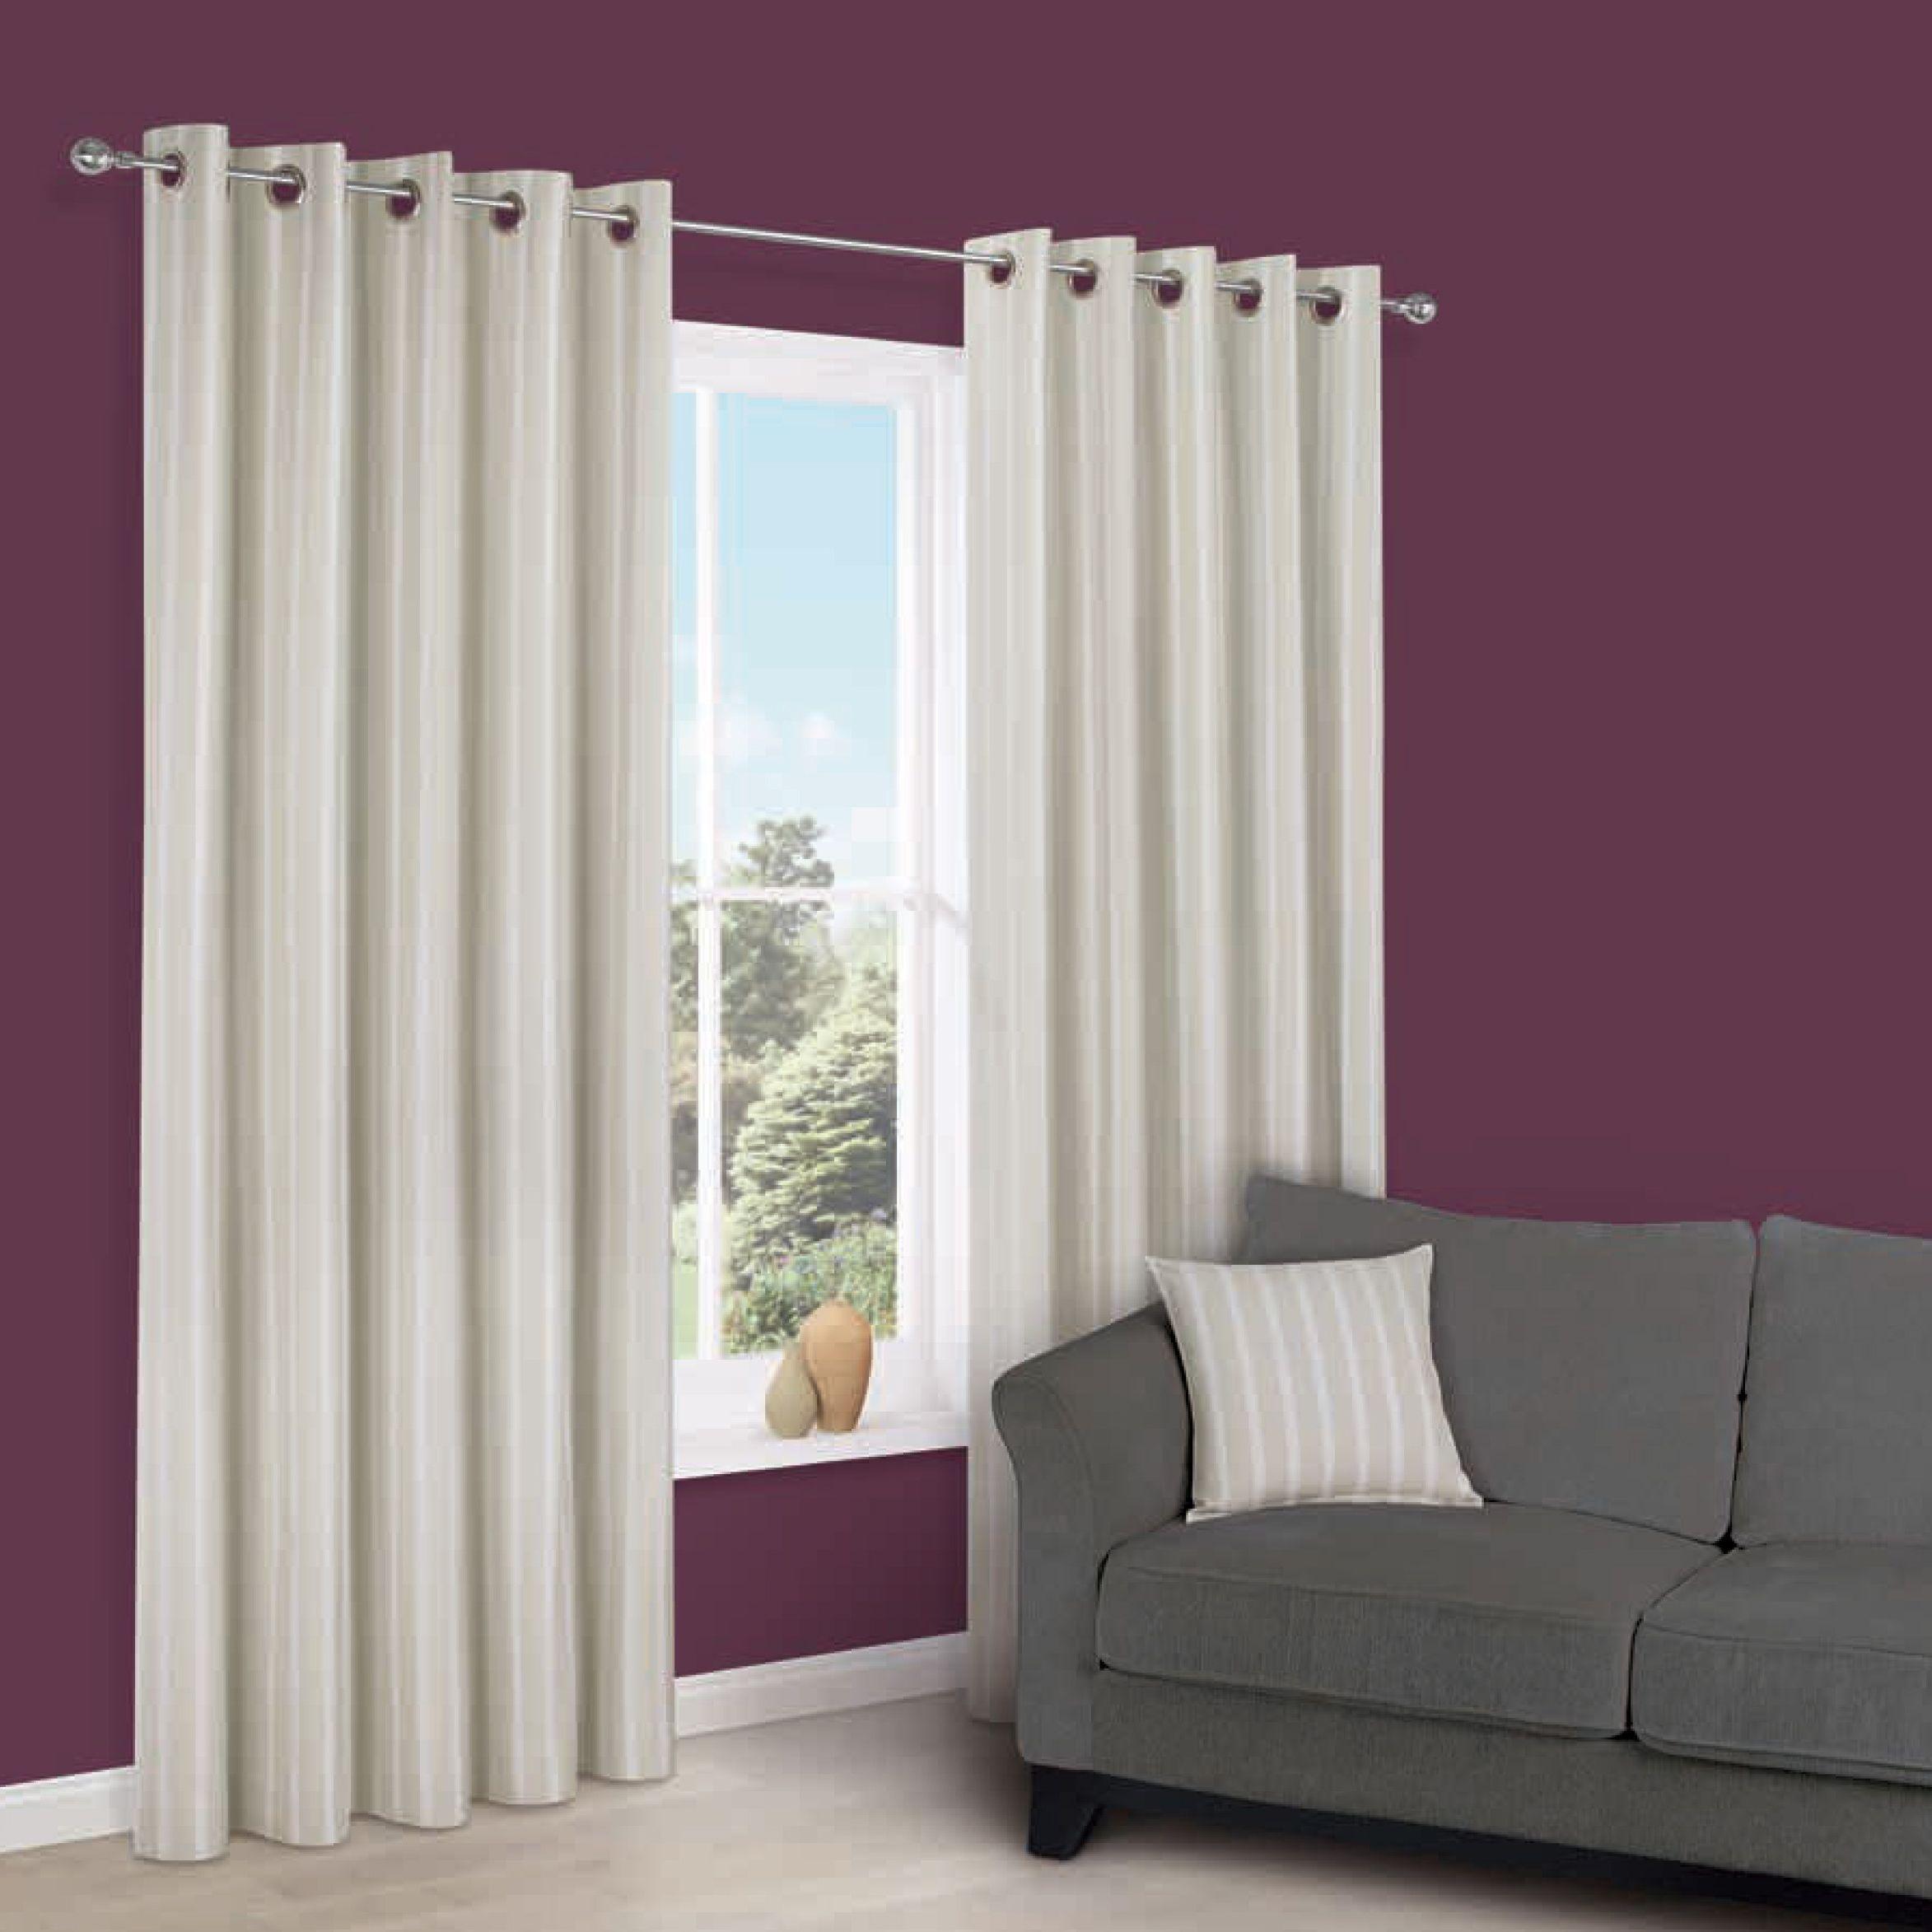 Cherelle Limestone Stripe Eyelet Lined Curtains (w)117 Cm (l)137 Cm